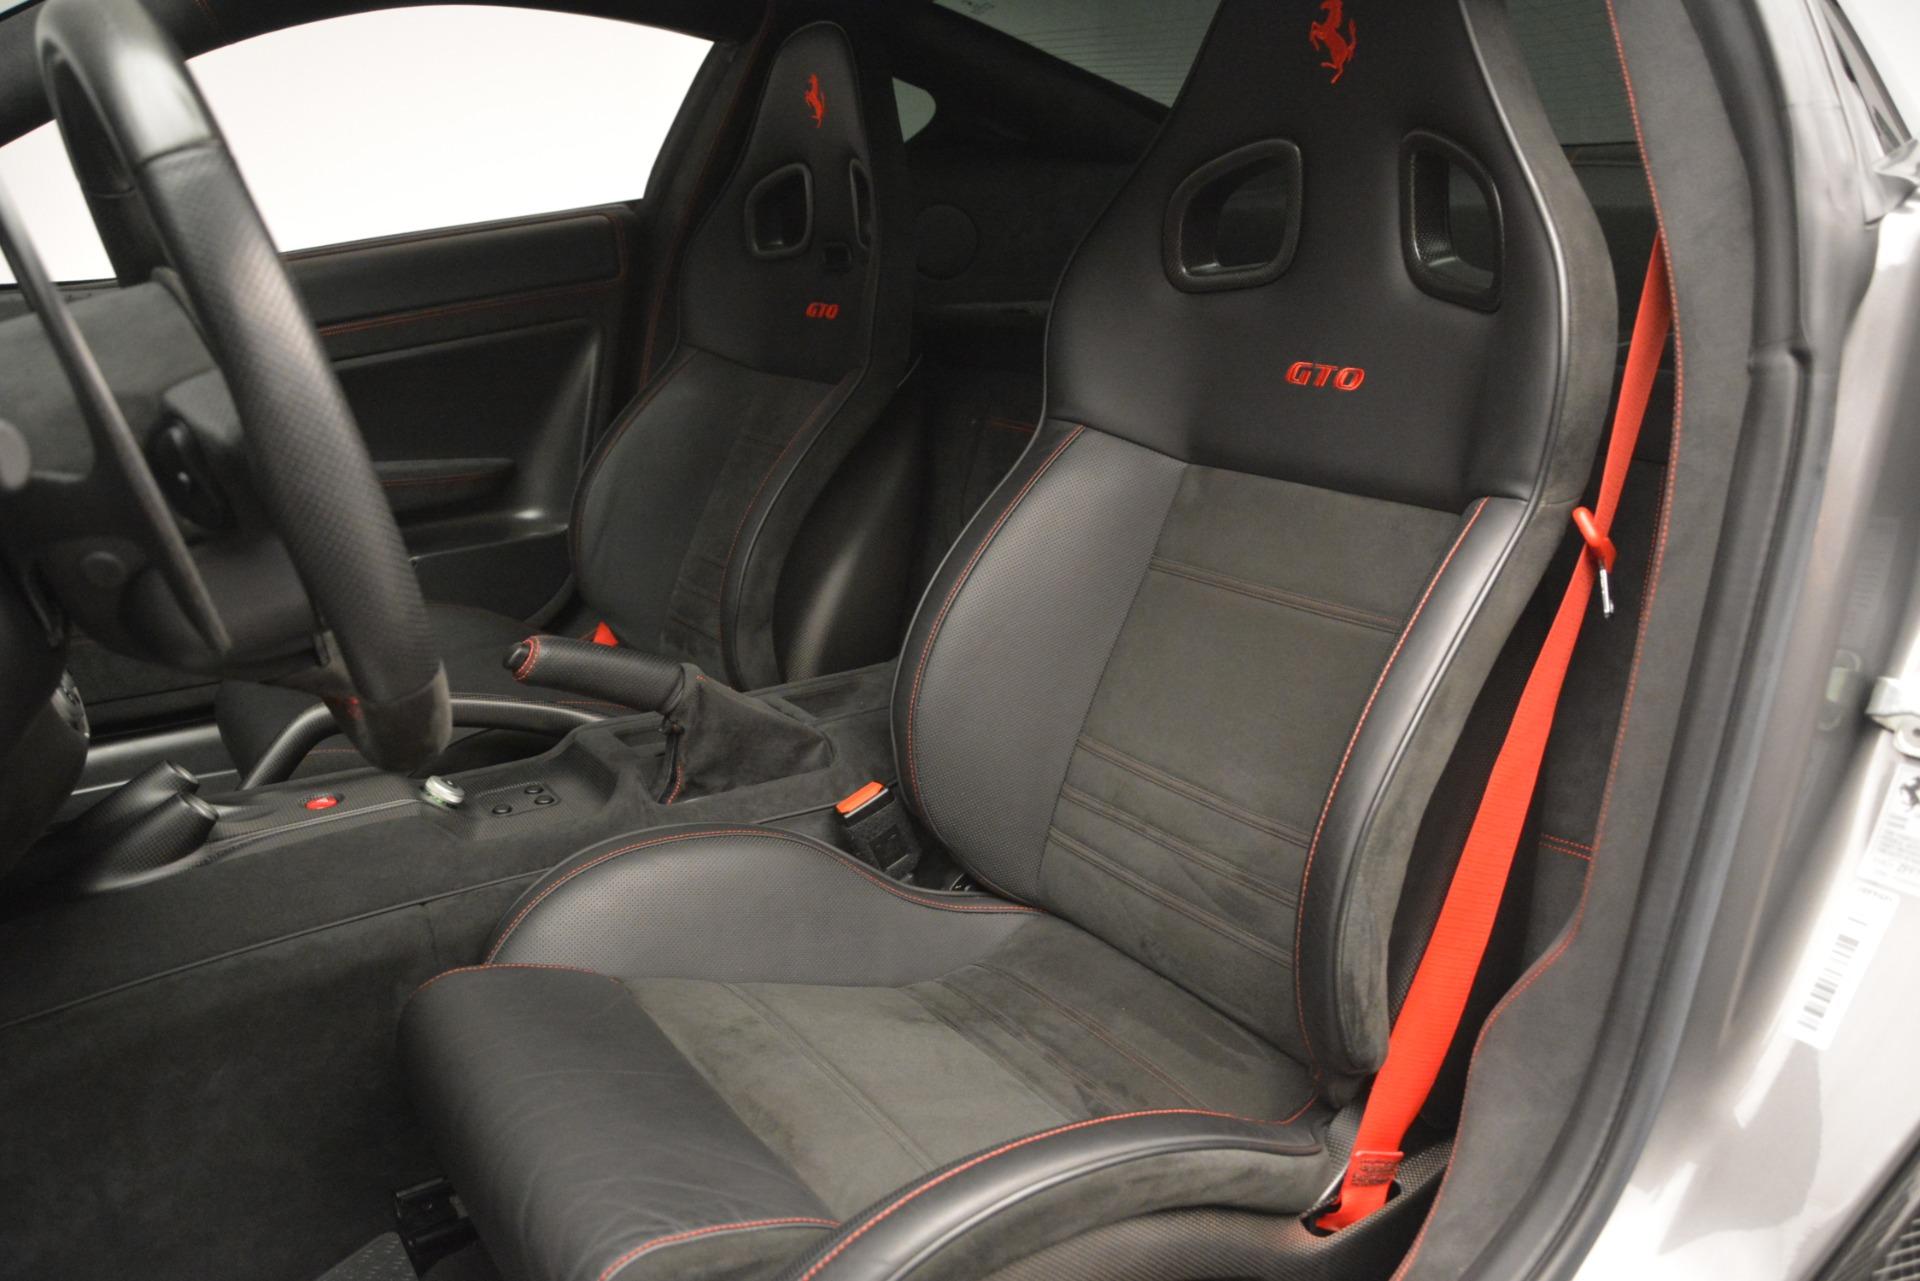 Used 2011 Ferrari 599 GTO  For Sale In Westport, CT 2724_p24